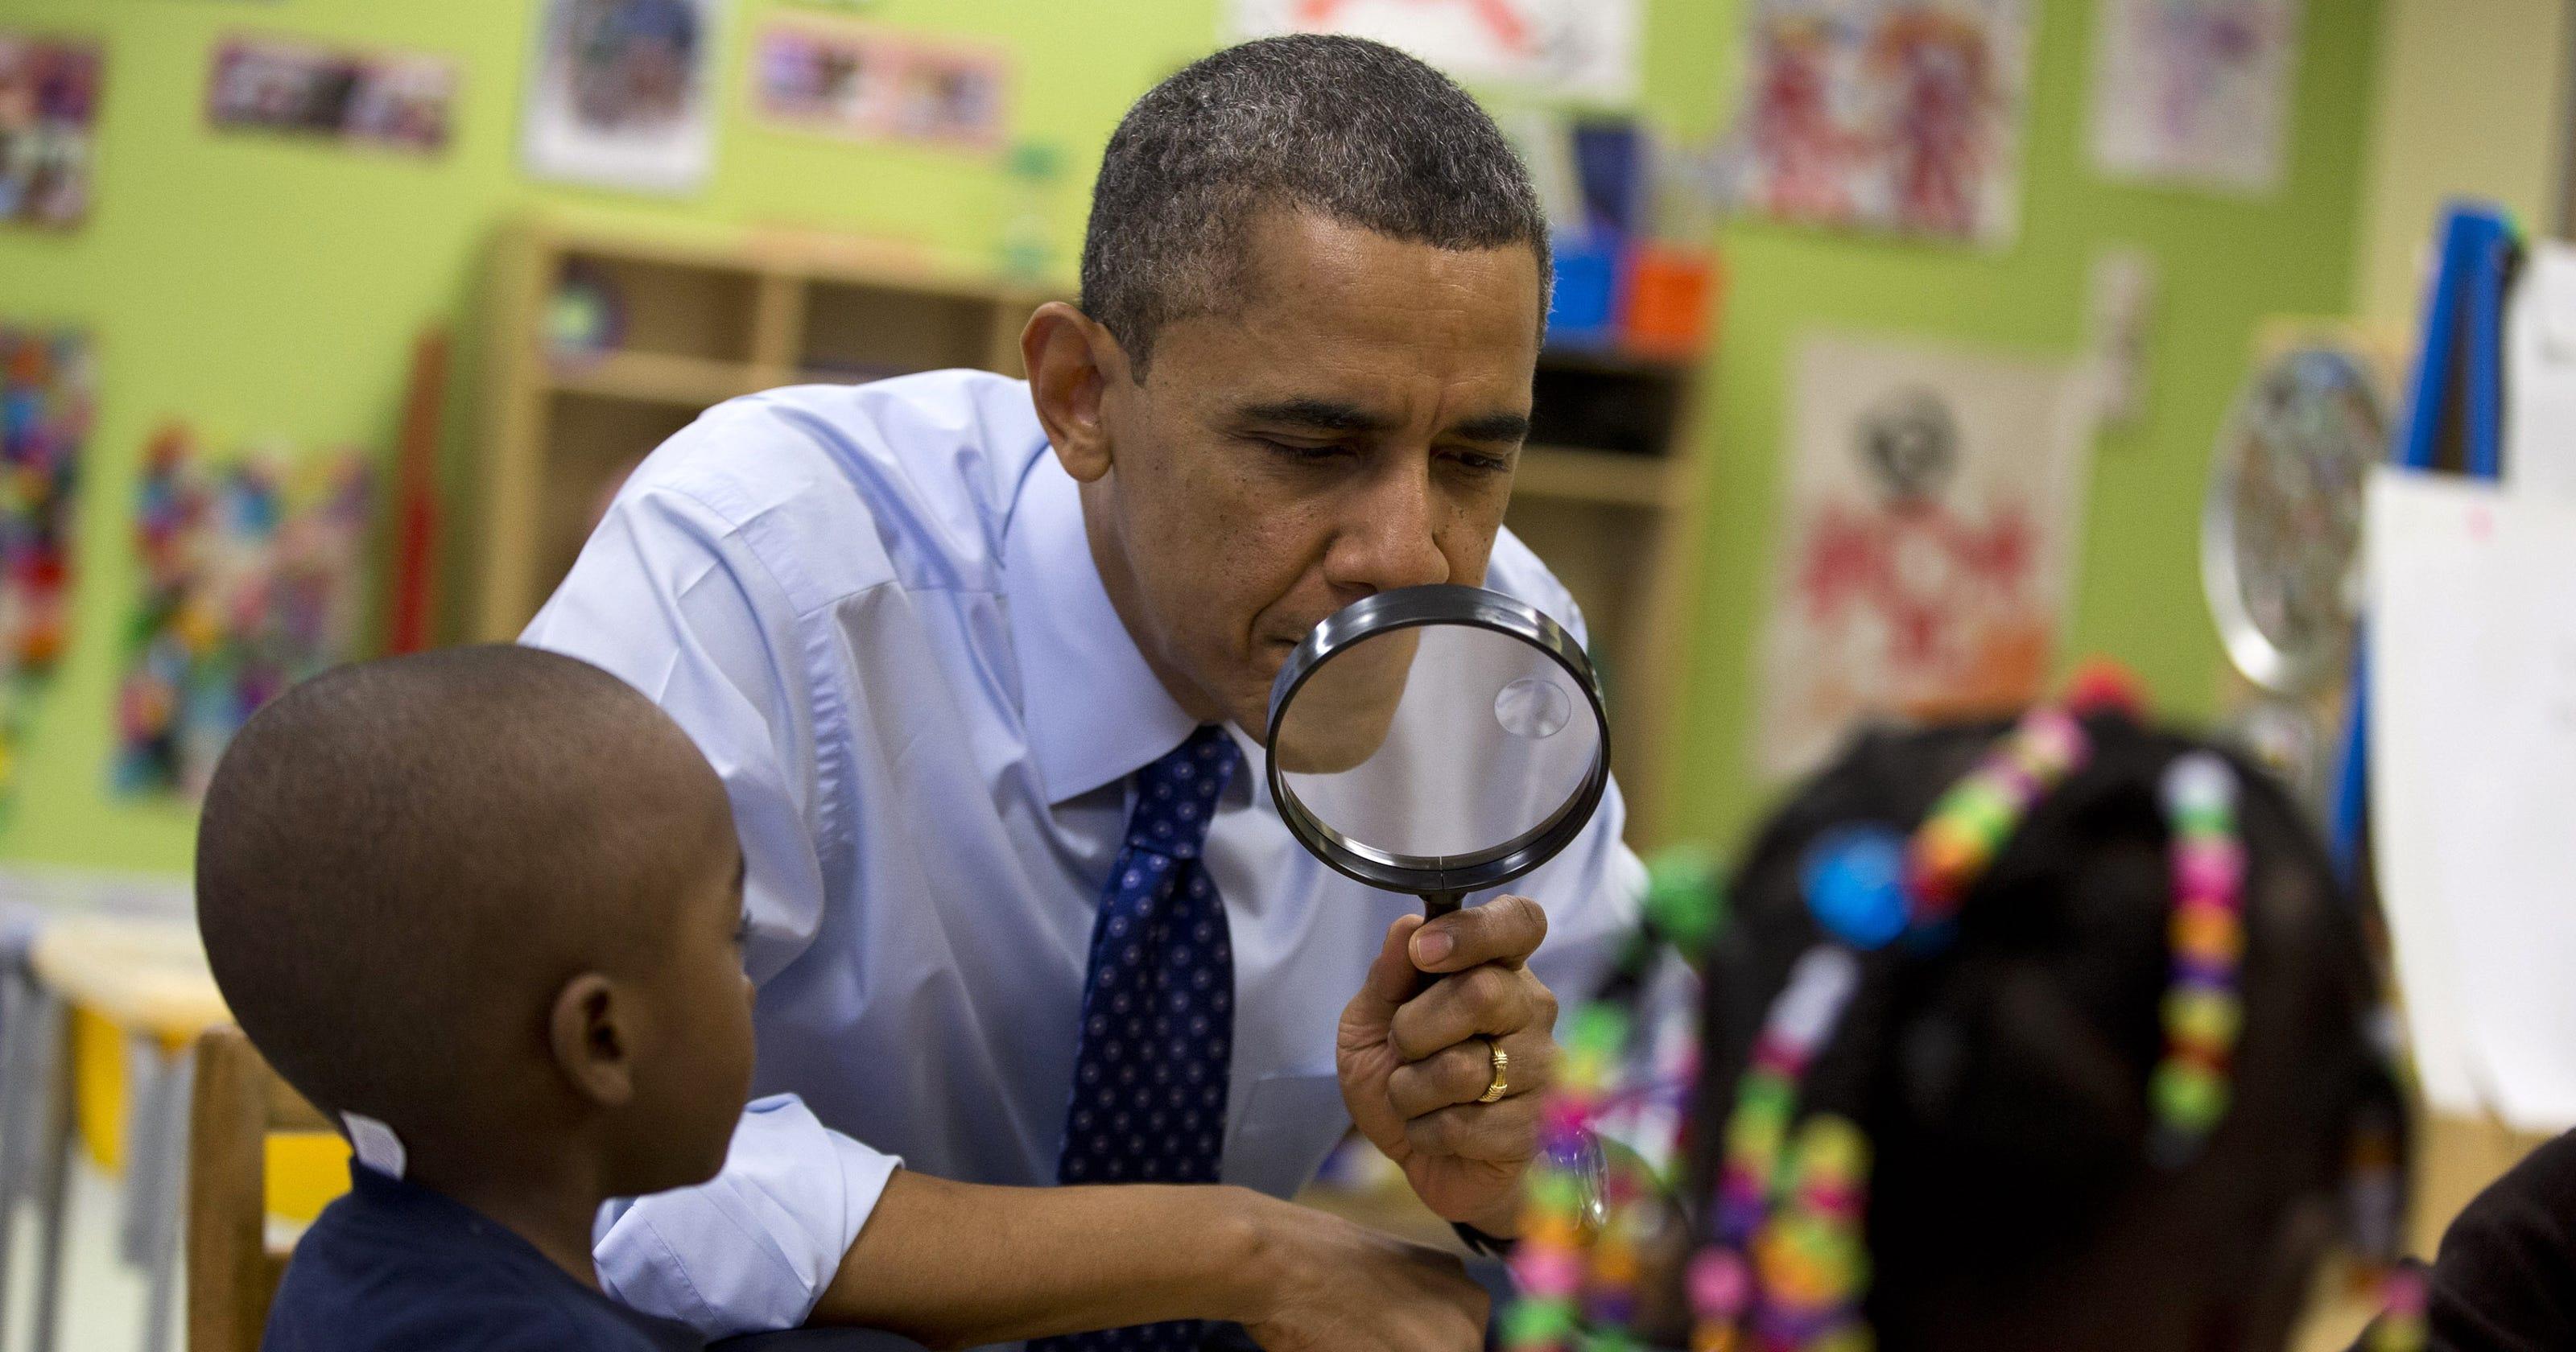 preschool learning alliance training obama promotes preschool education in visit 216